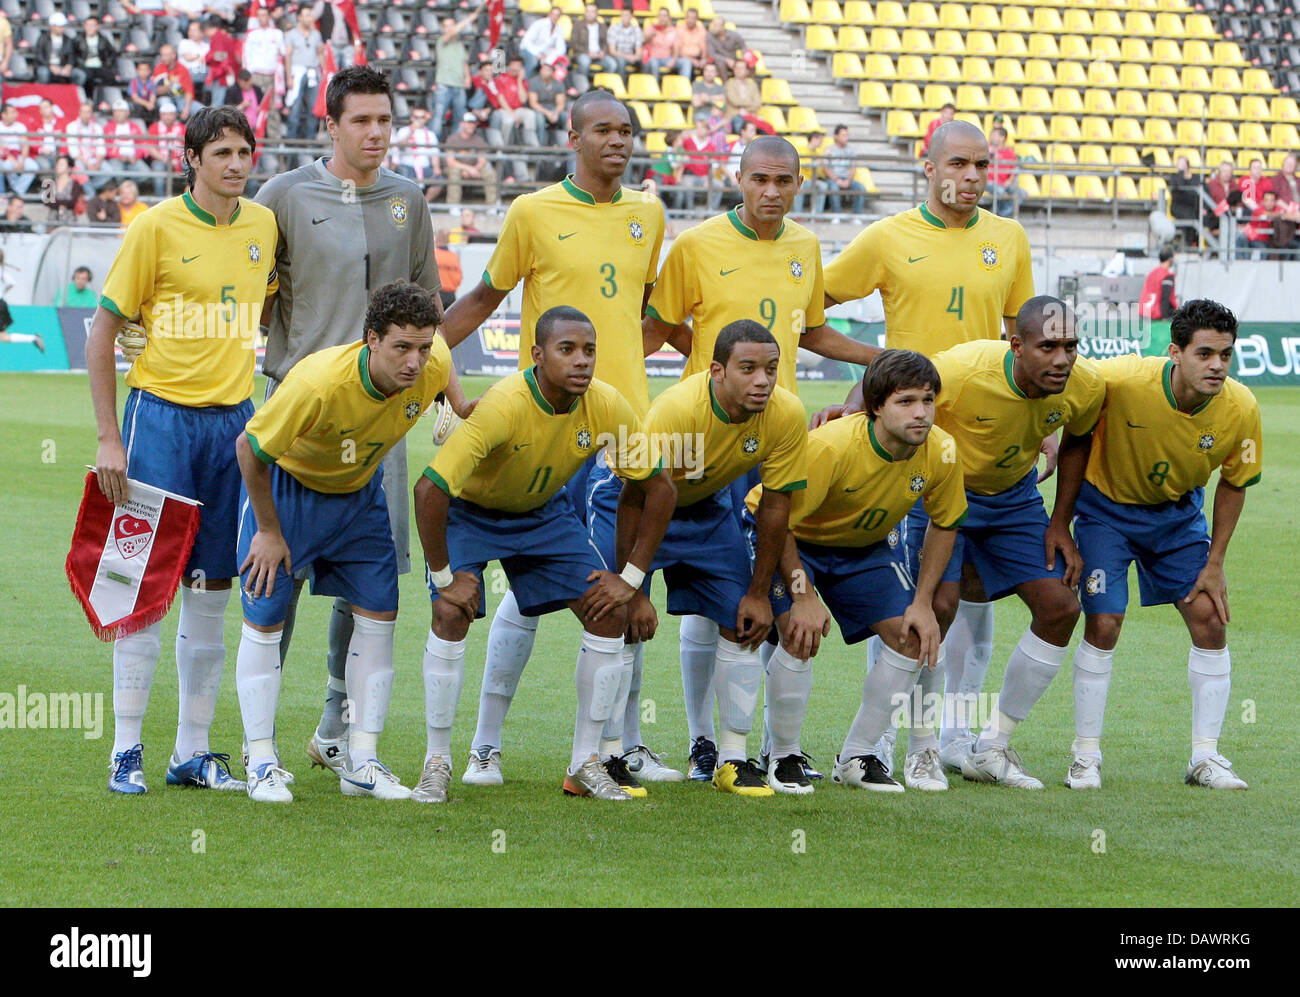 The Brazilian starting side pose for the friendly Brazil v Turkey at the Signal Iduna Park stadium of Dortmund, - Stock Image